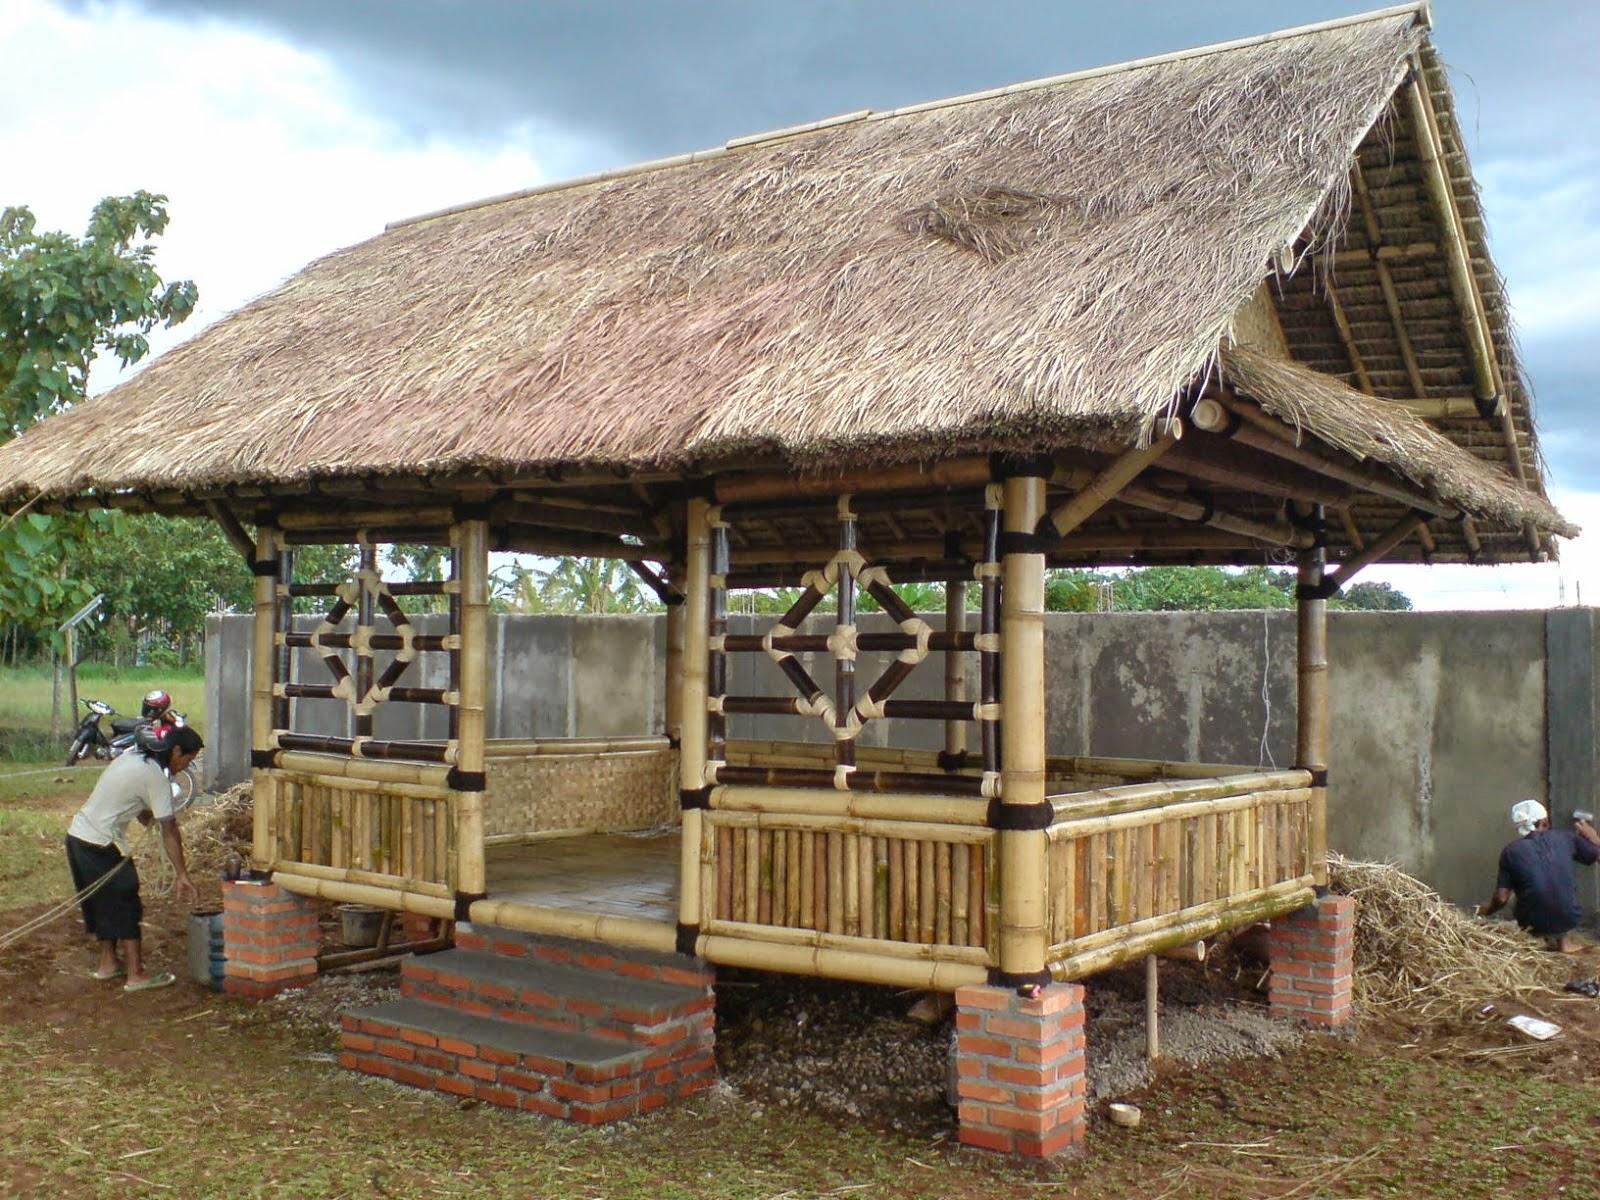 Saung gazebo bambu | jasa pembuatan saung bambu | saung bambu hitam | saung kayu kelapa